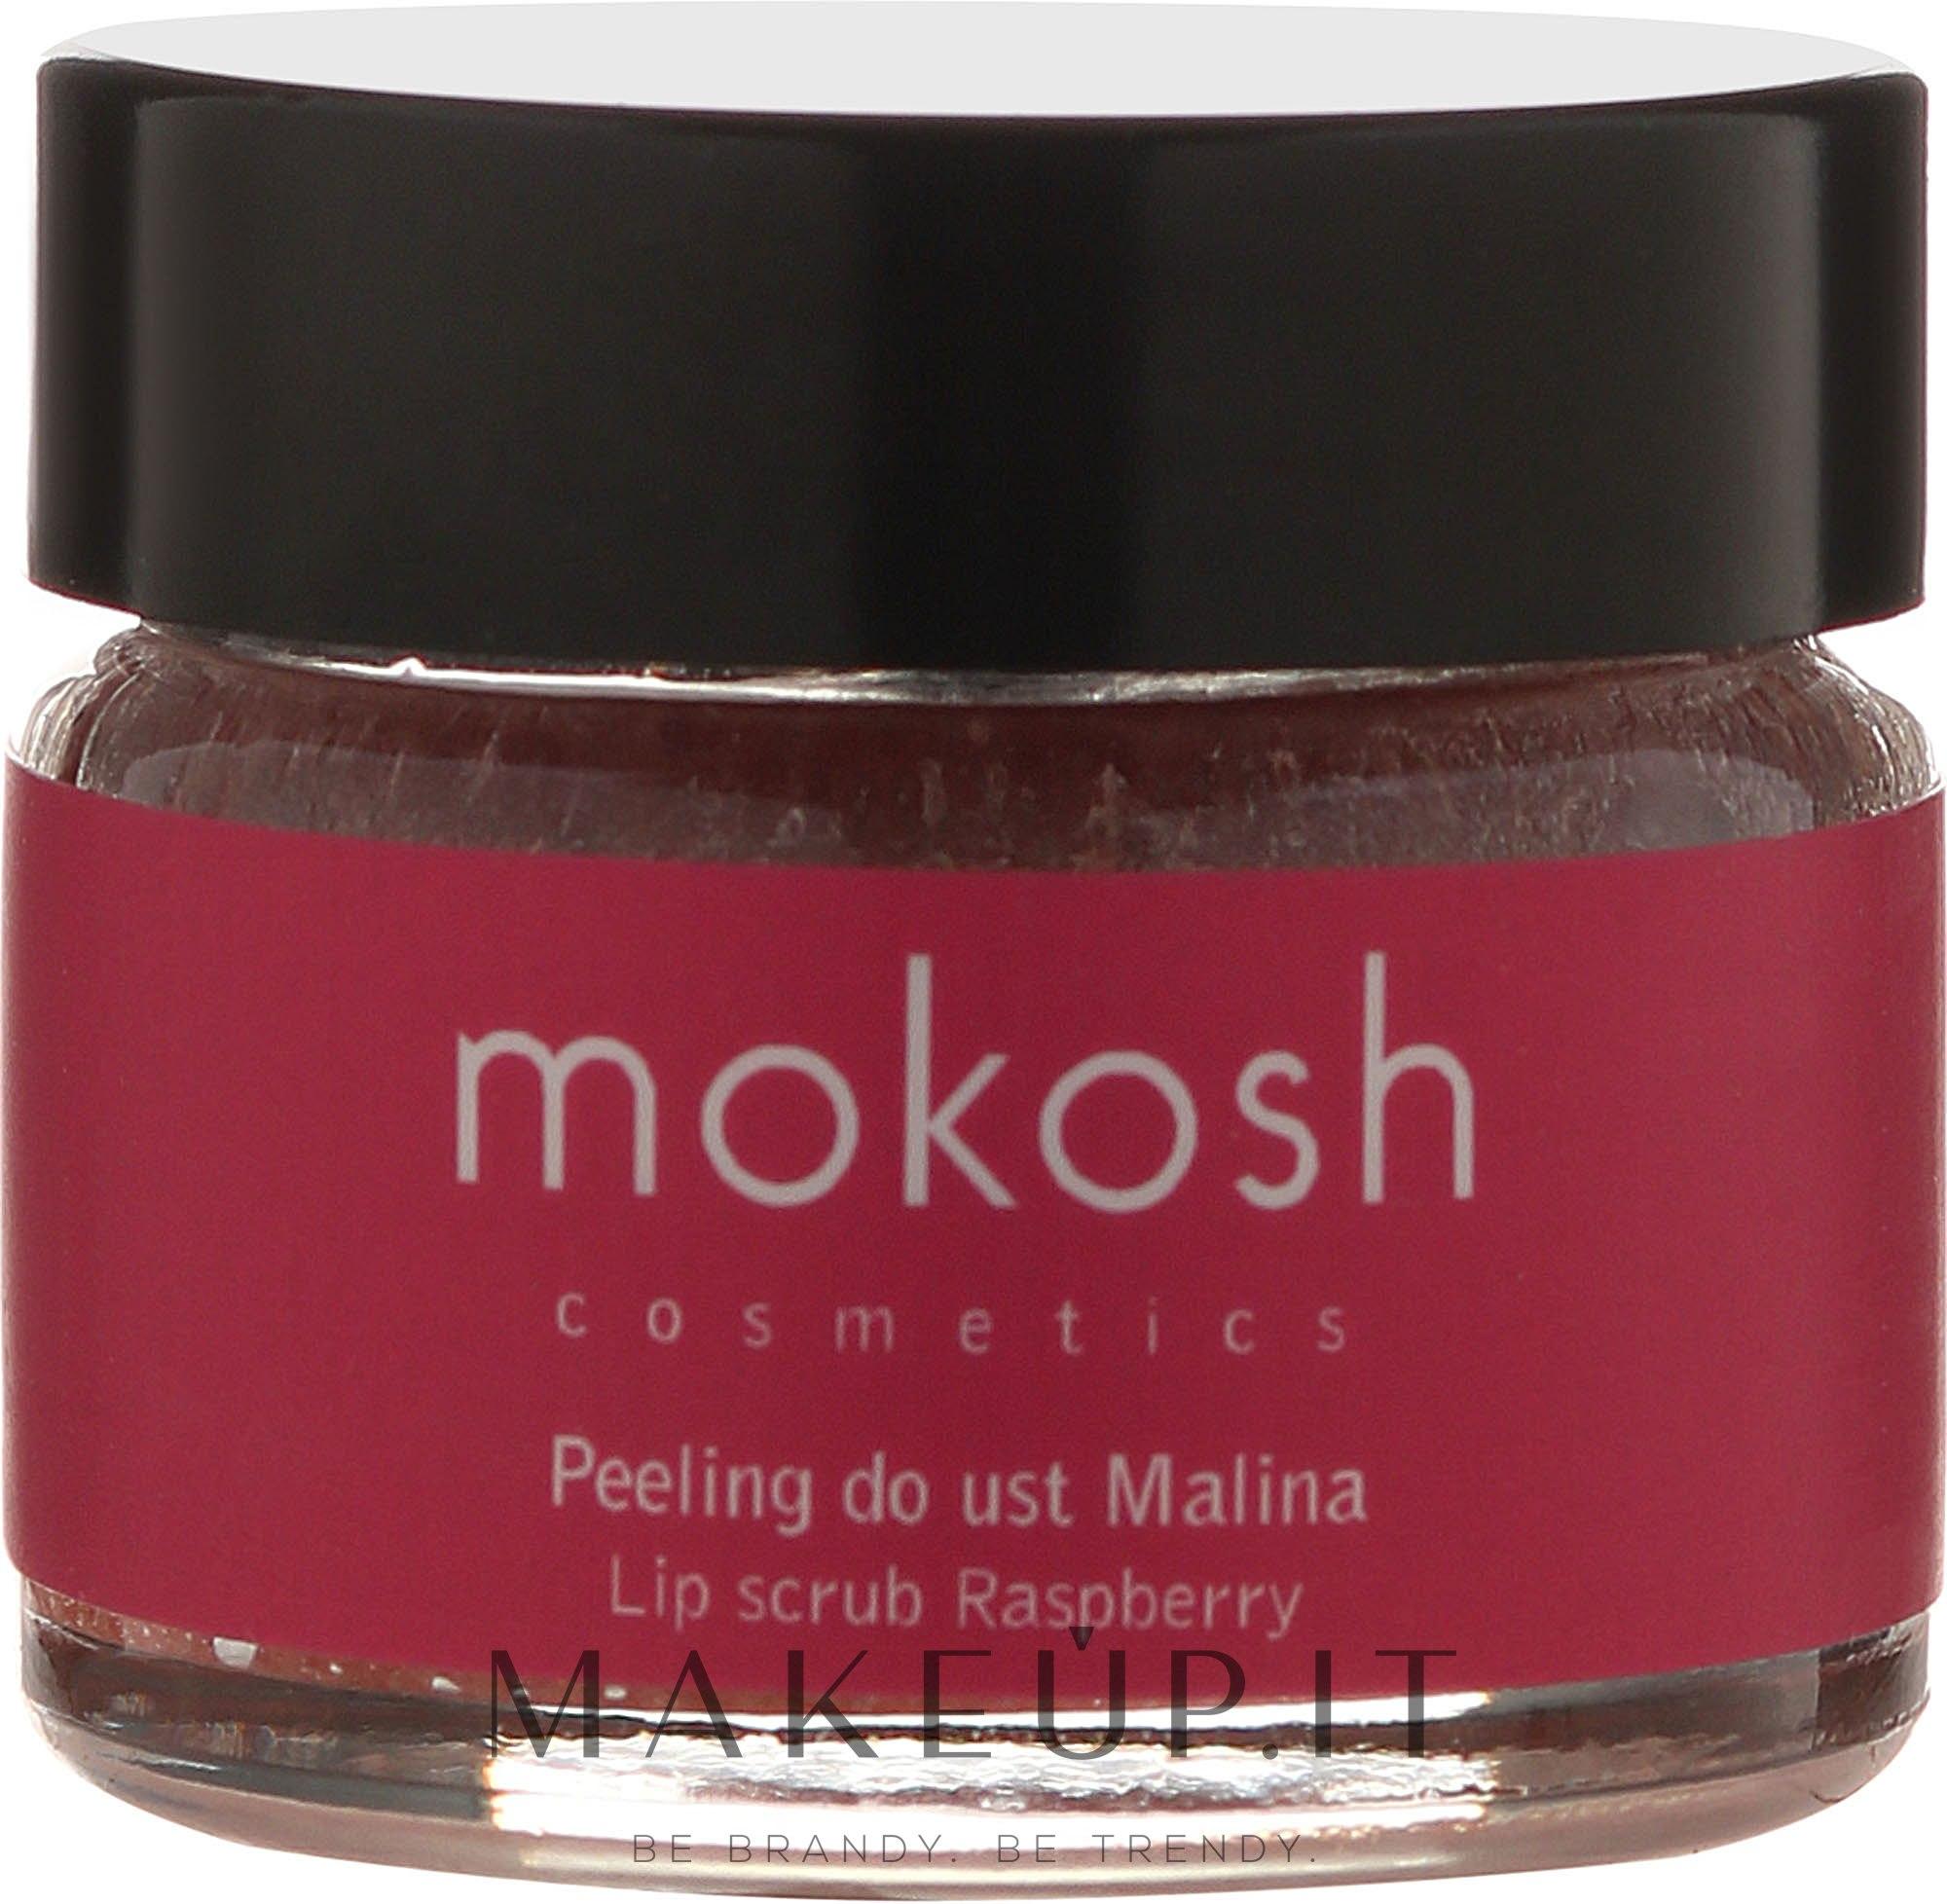 "Scrub labbra ""Lampone"" - Mokosh Cosmetics Lip Scrub Raspberry — foto 15 ml"